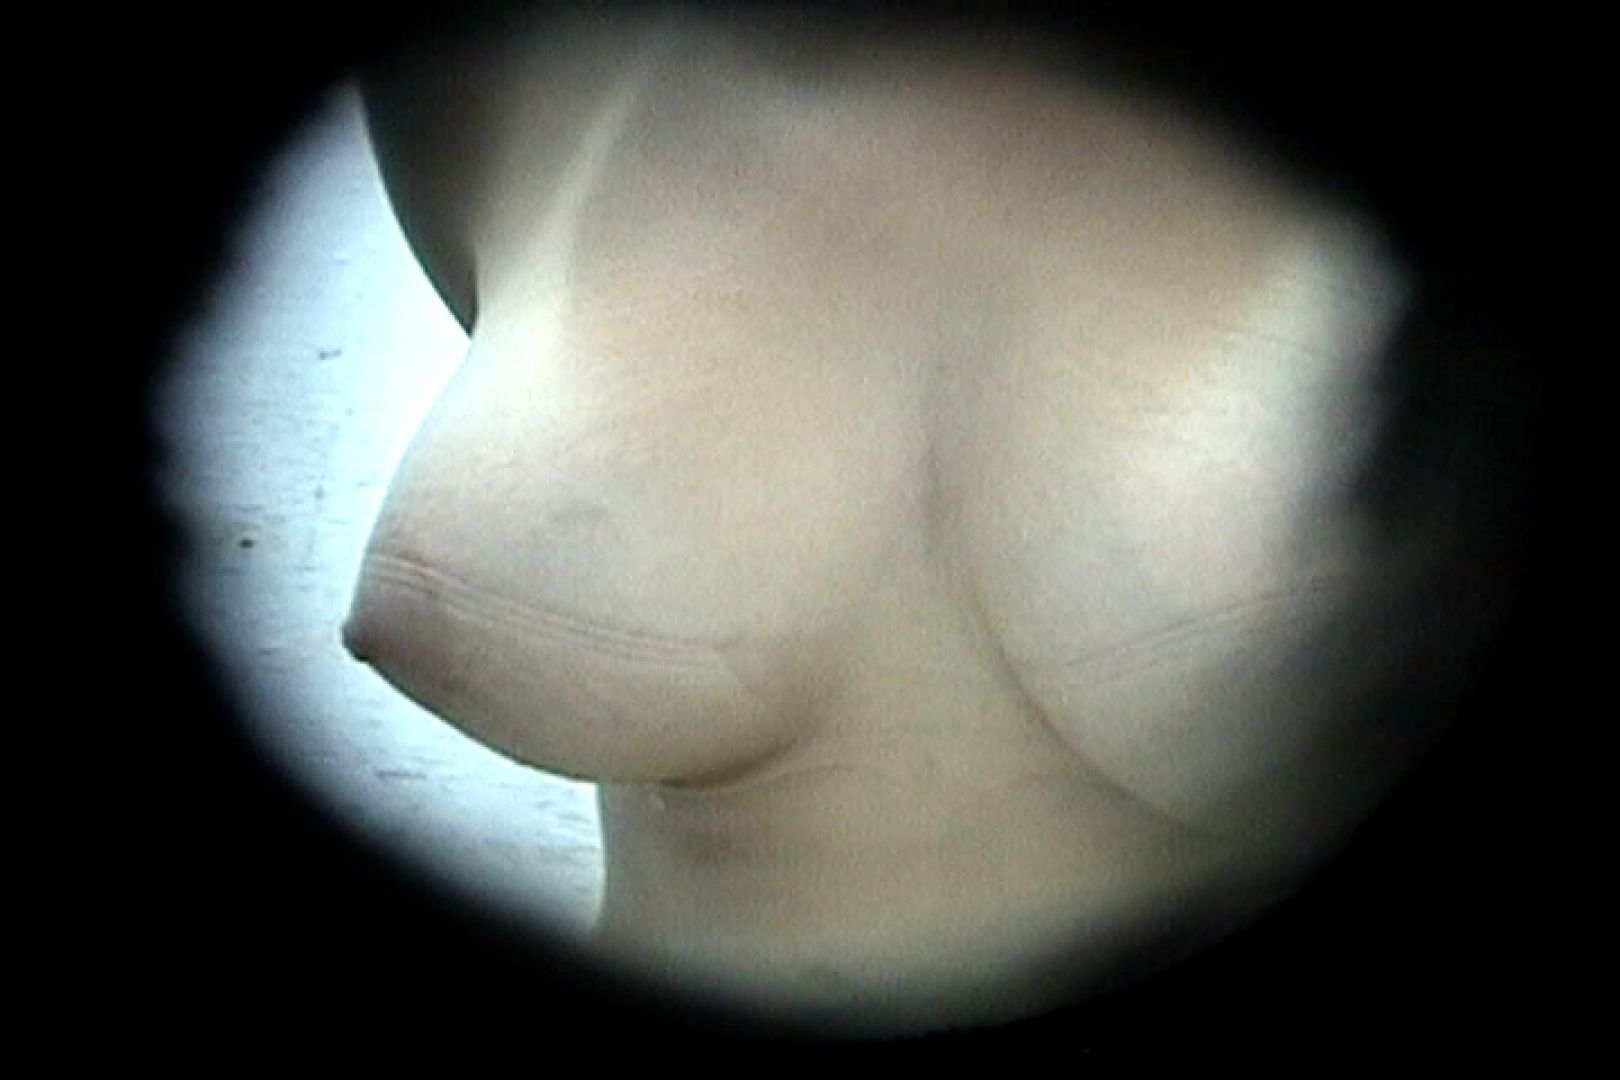 No.80 見事な巨乳にピンクの巨乳輪 巨乳 AV動画キャプチャ 38連発 22